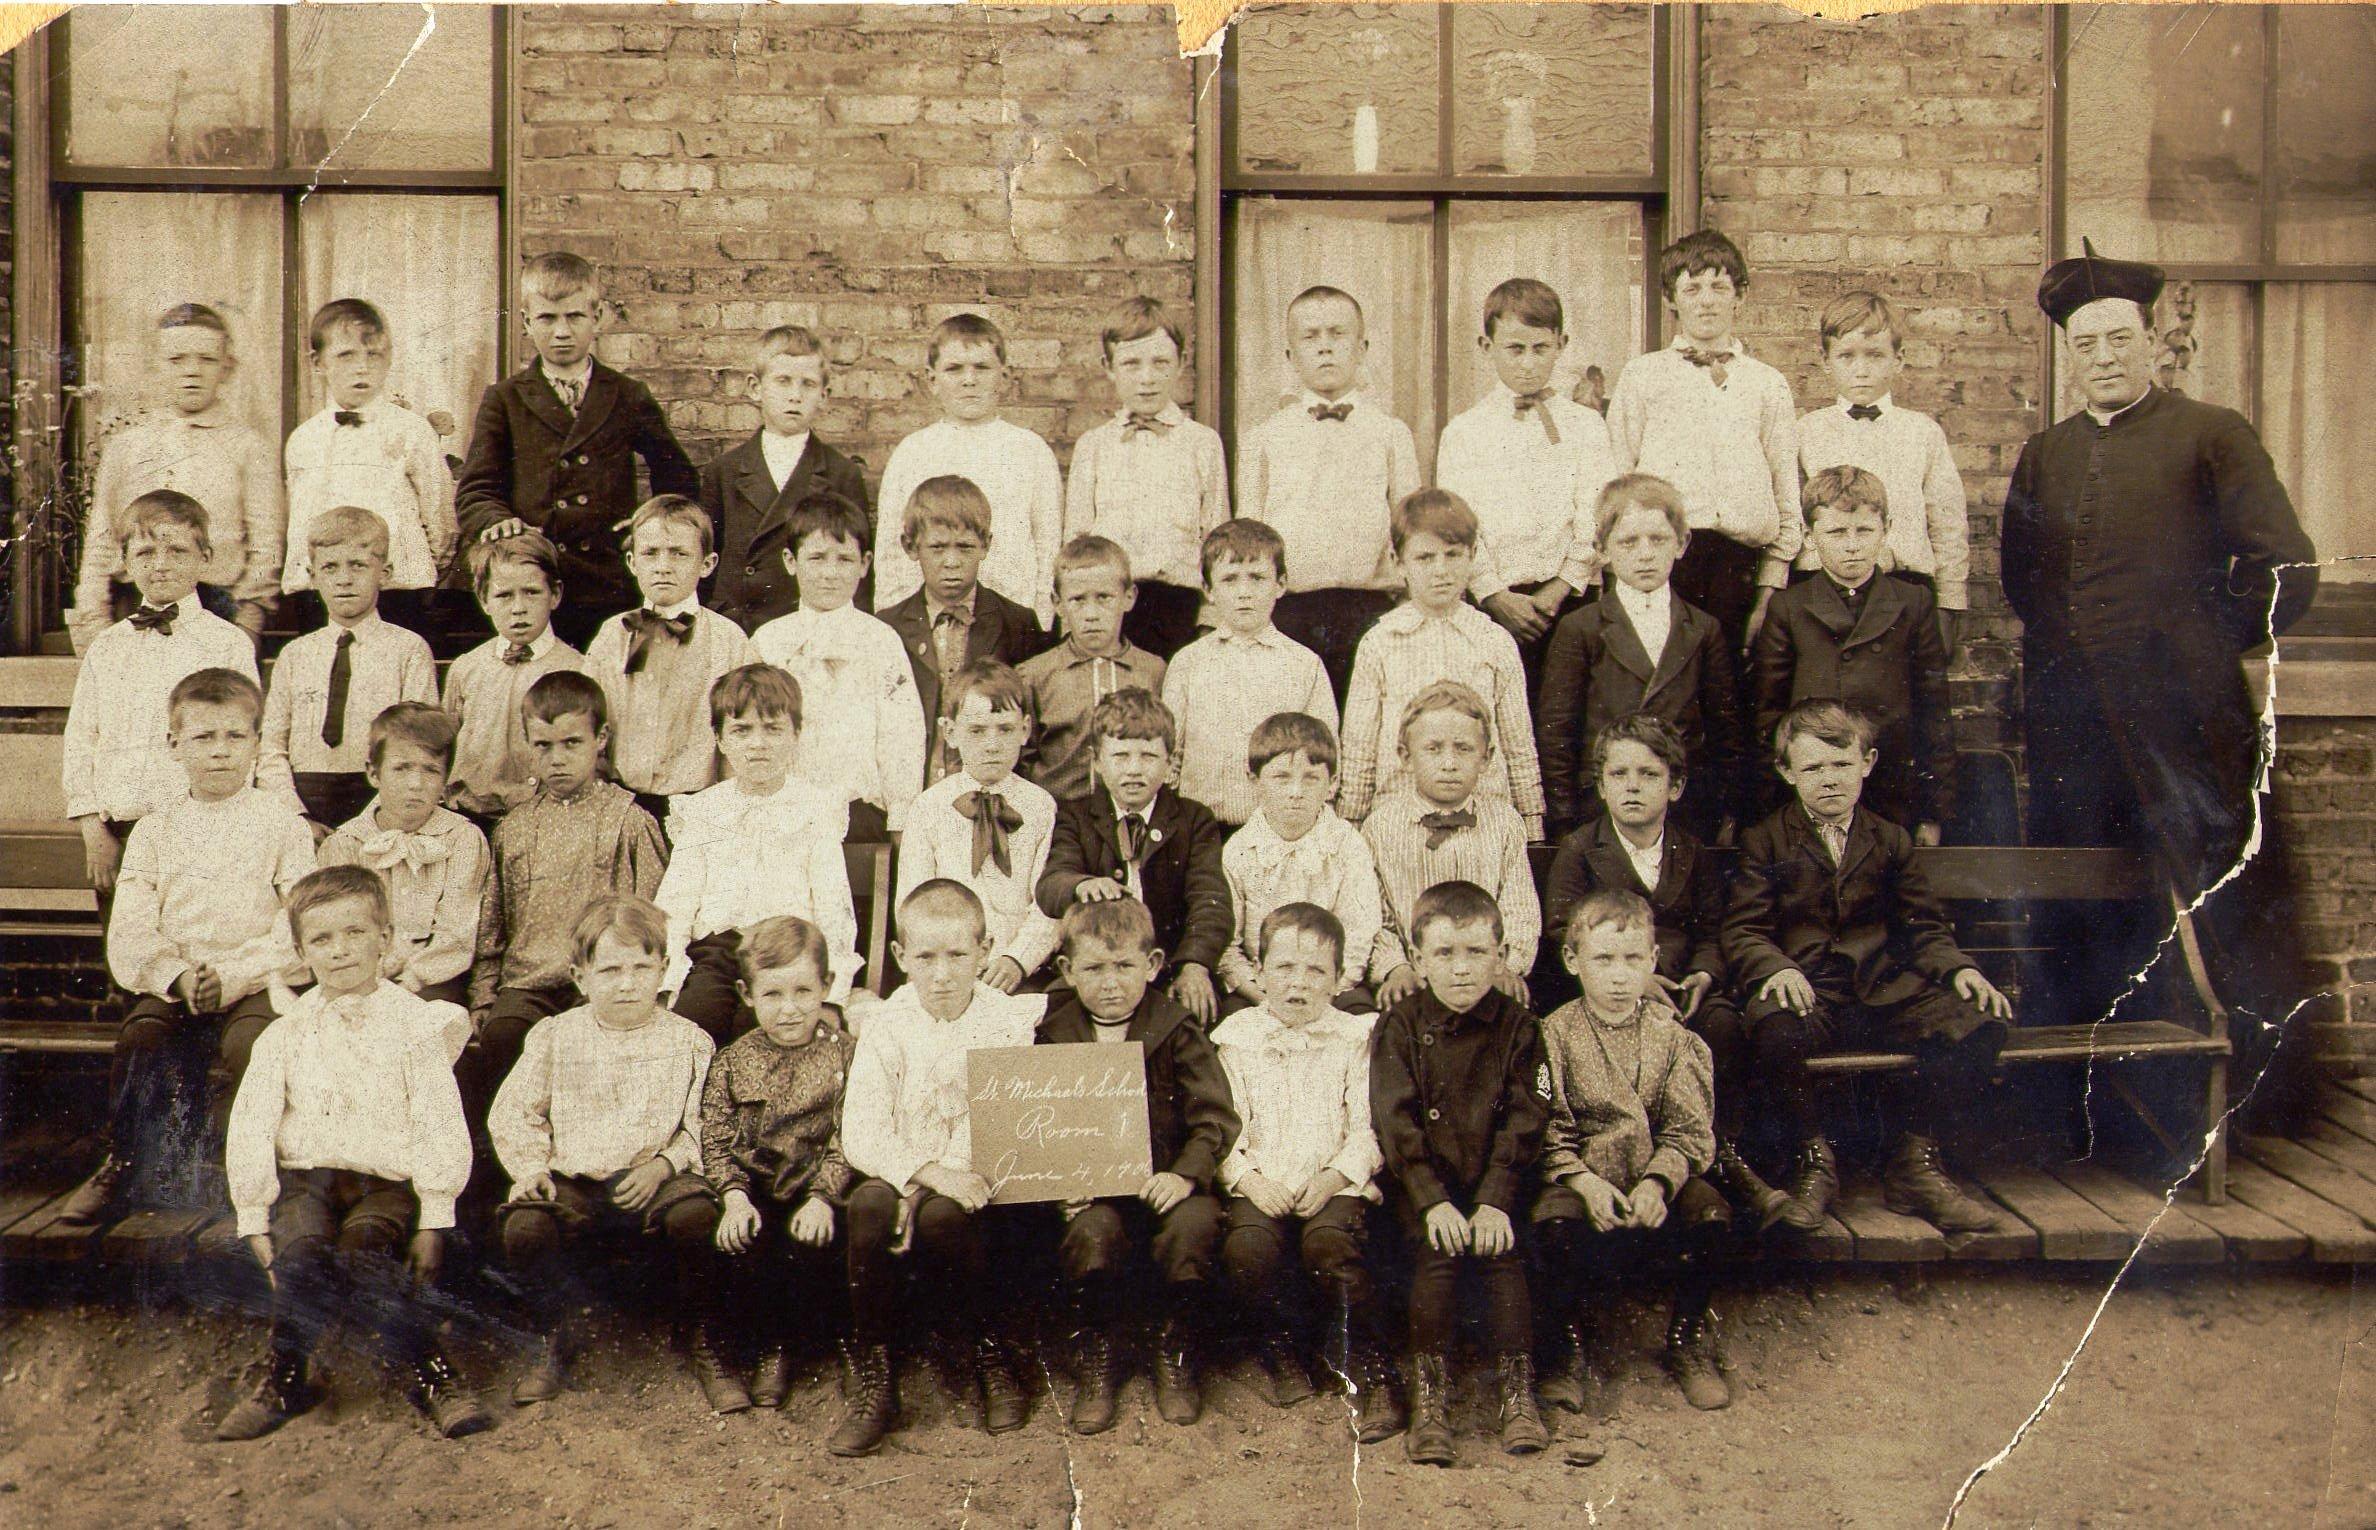 St. Michael's Class of 1906